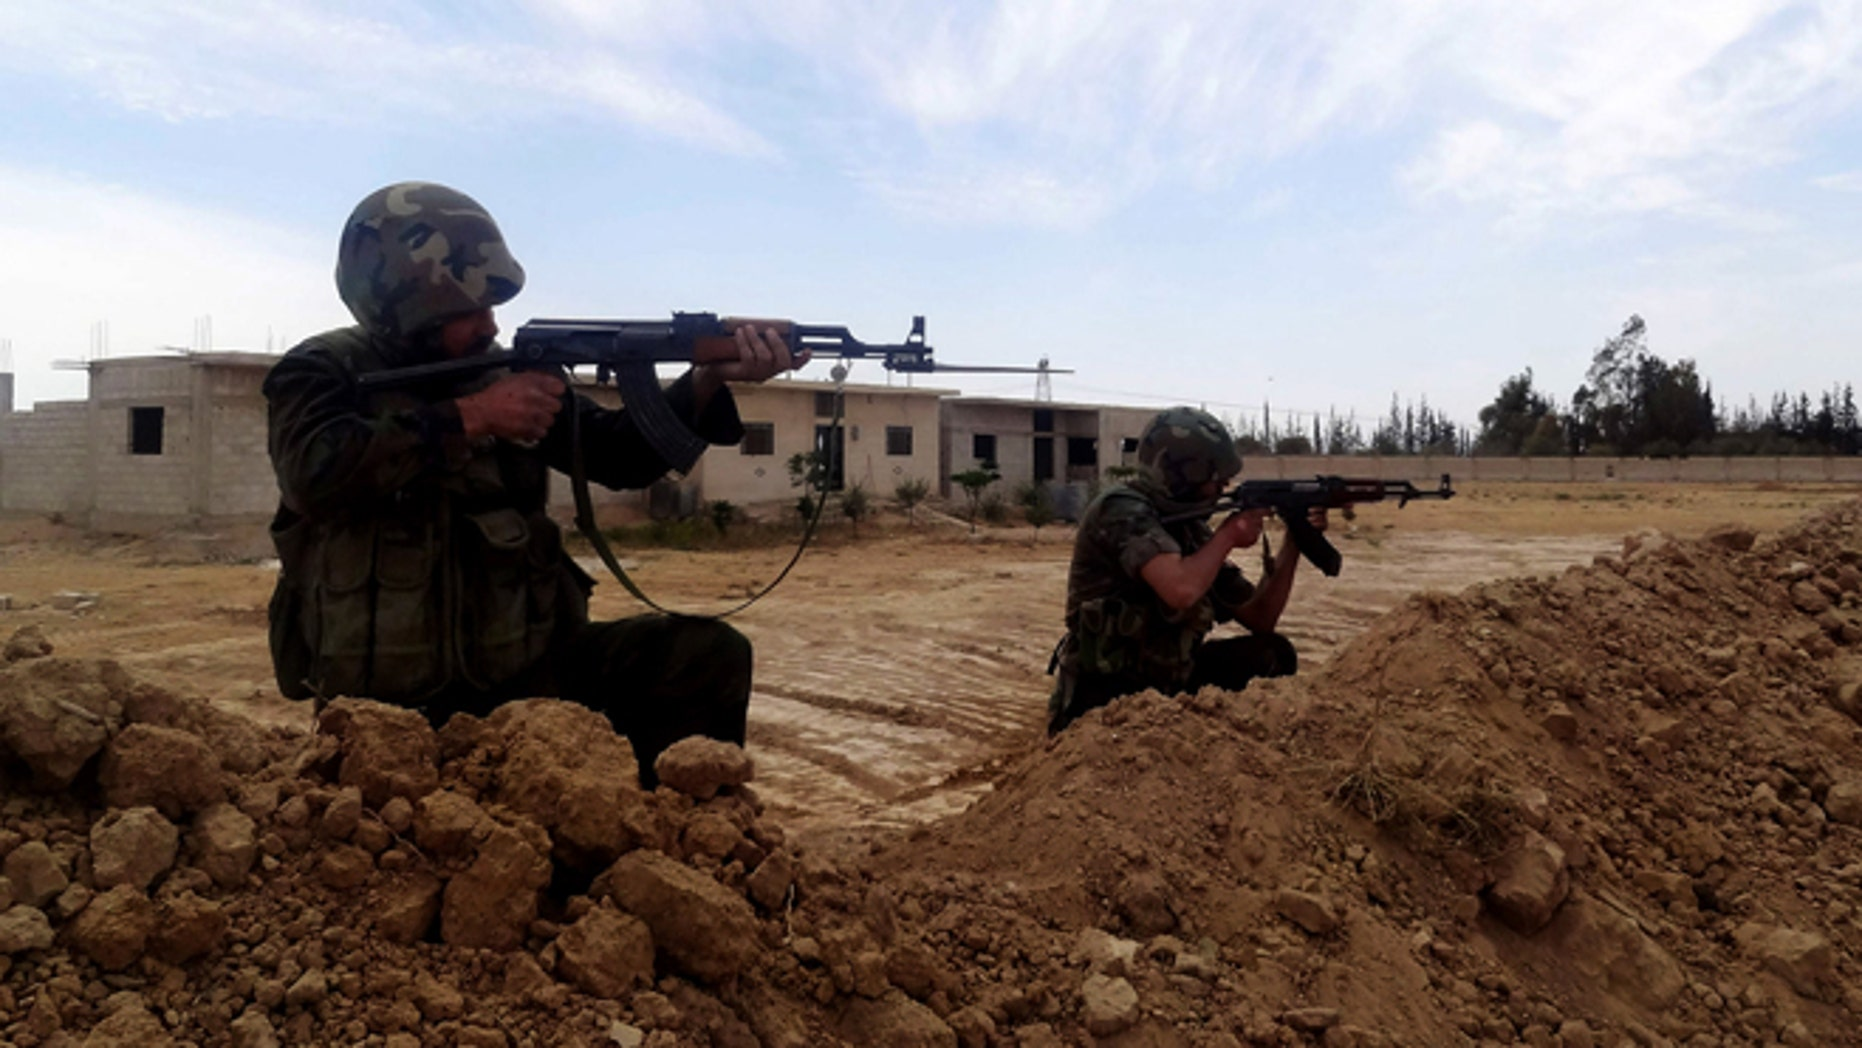 Syrian Army Foiled Attack In Eastern Daraa, Killed Six Gunmen (Photos)